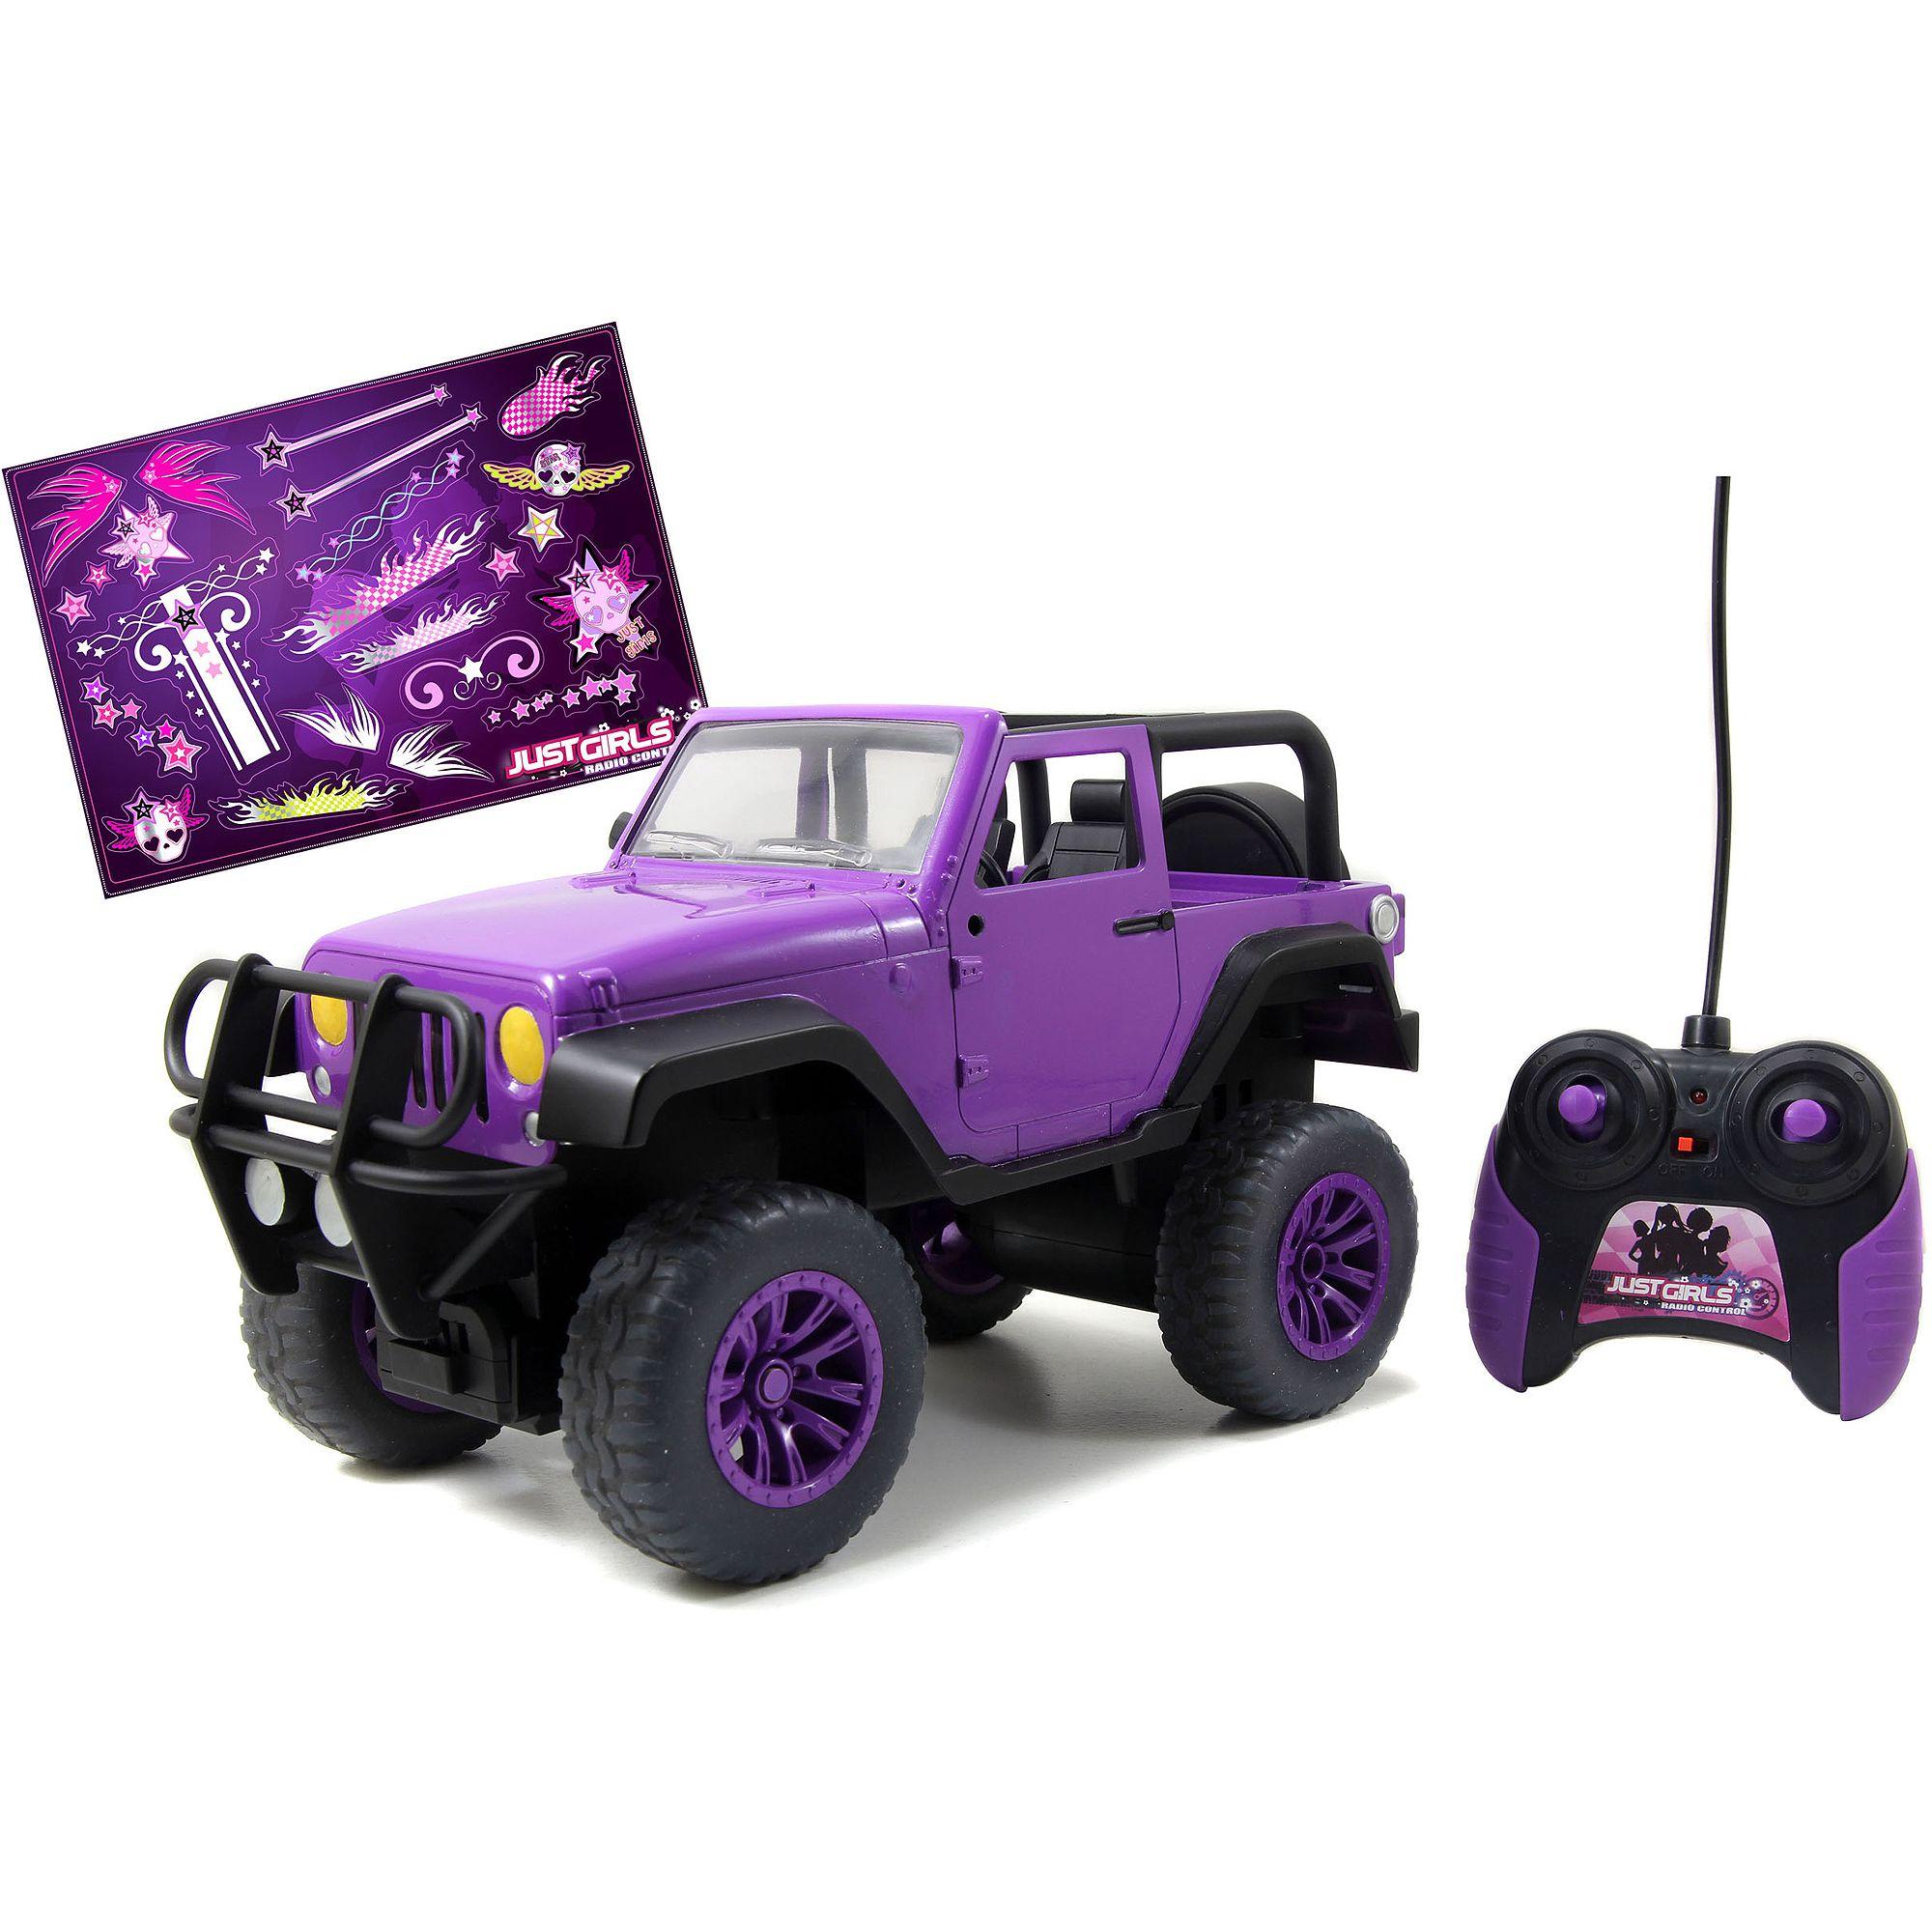 Jada Toys GirlMazing Remote Control Big Foot Jeep